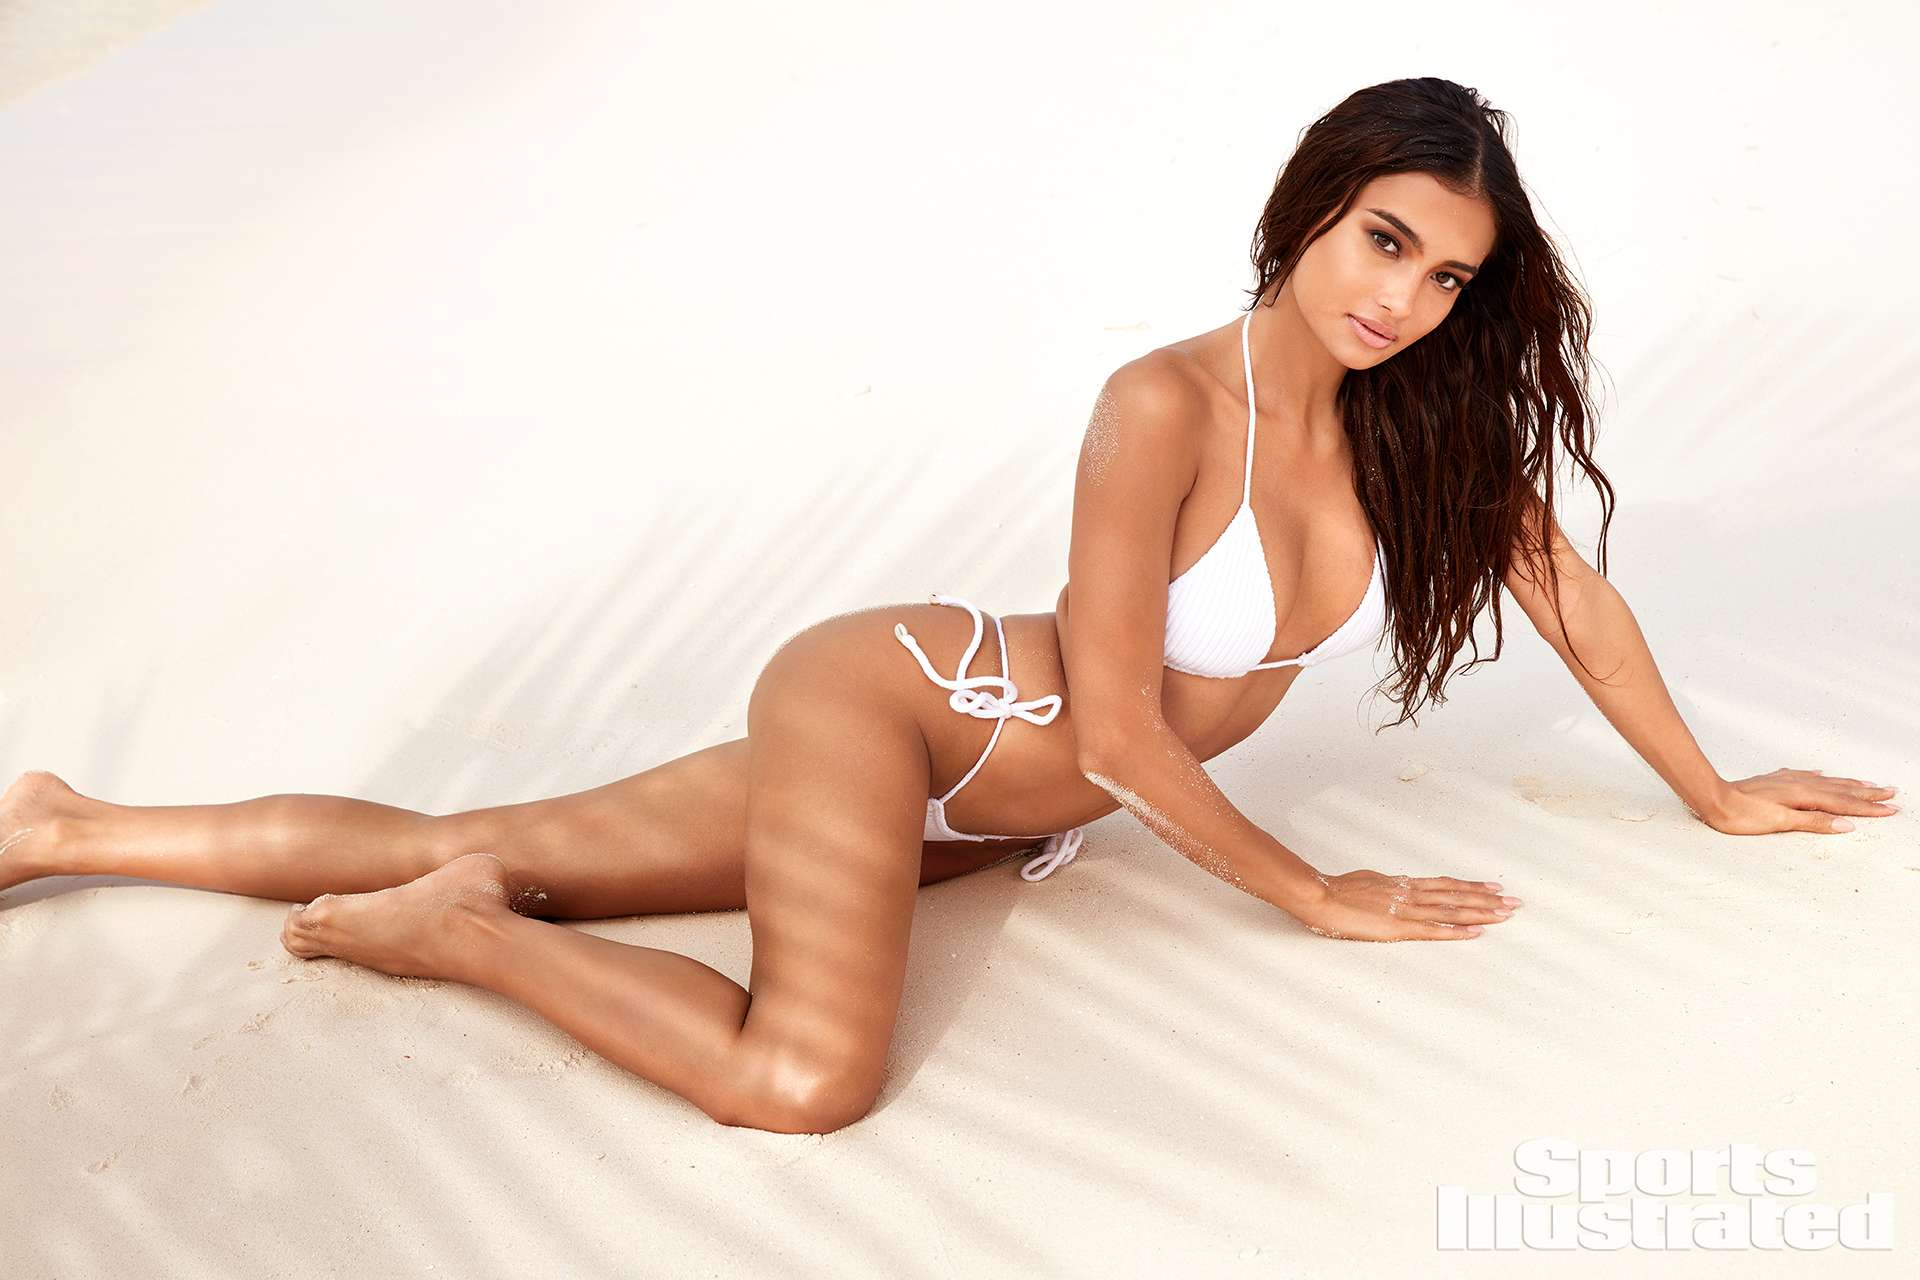 Great Exuma: Kelsey Merritt für die Sports Illustrated Swimsuit Issue 3